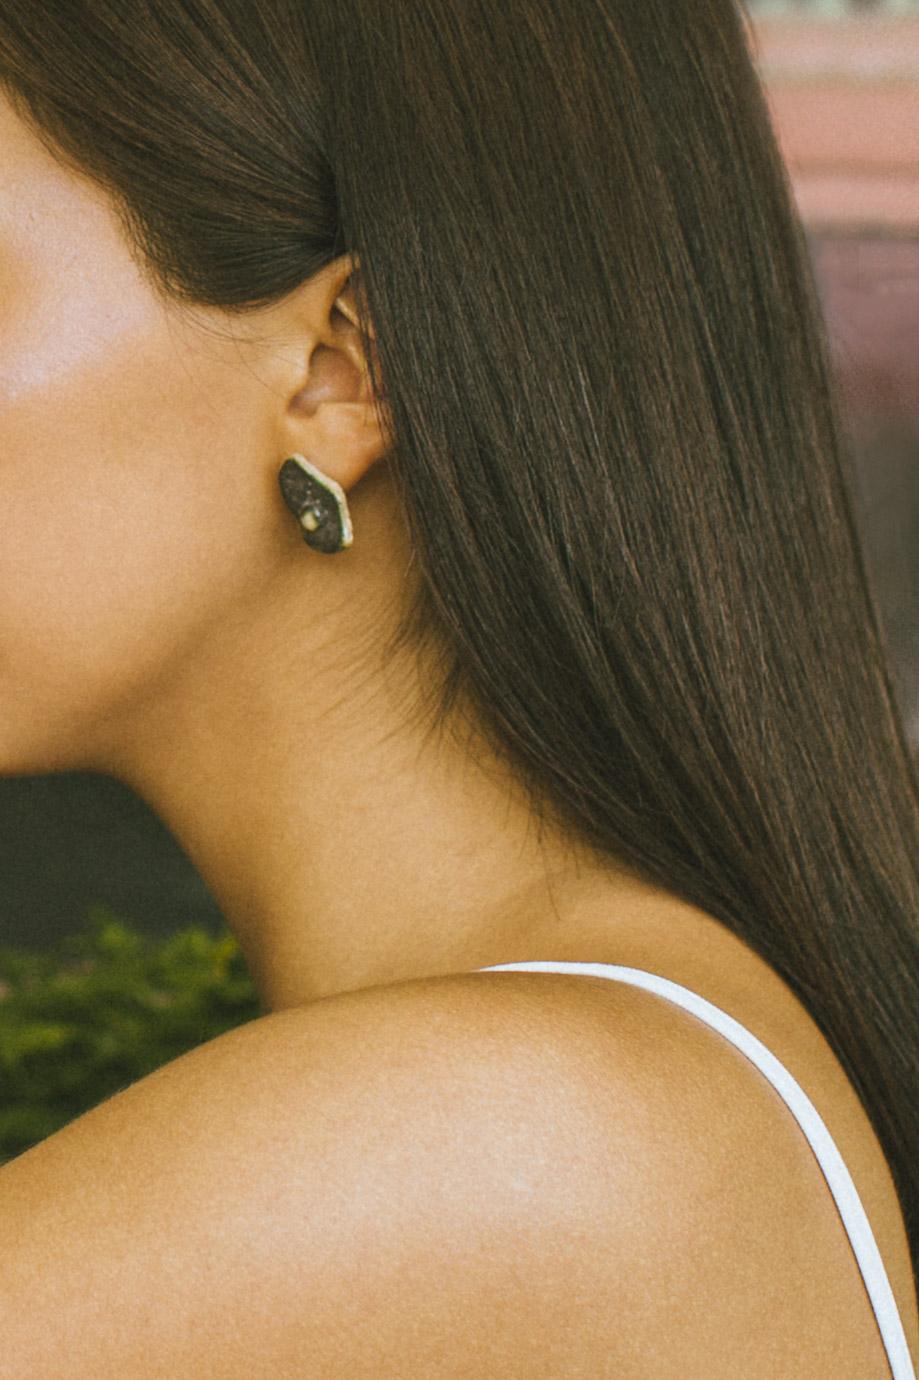 huevito close up.jpg